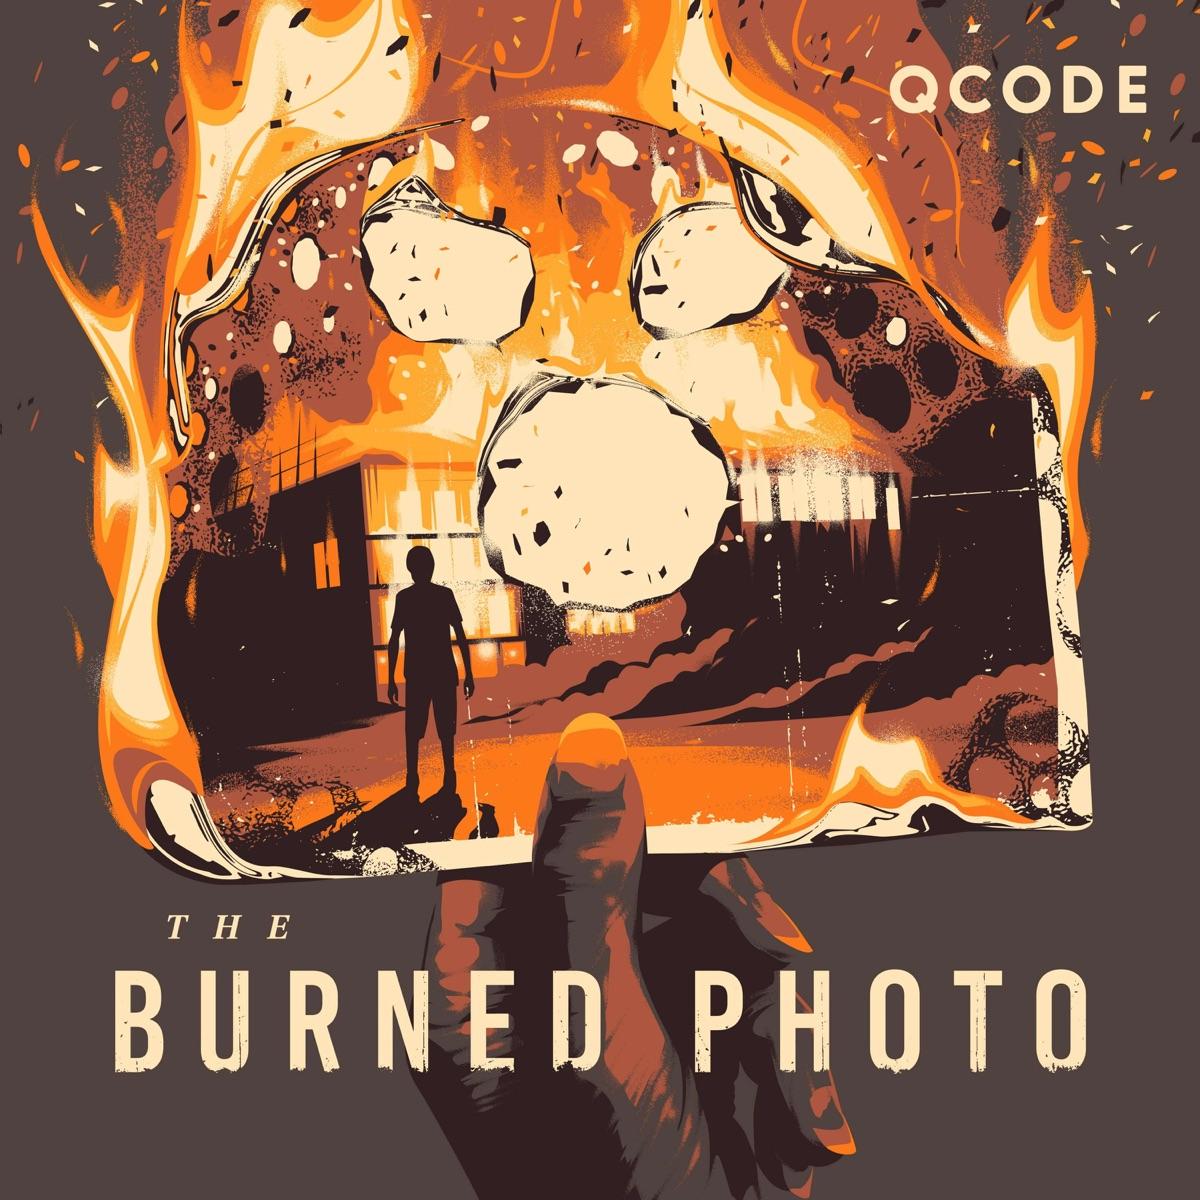 The Burned Photo